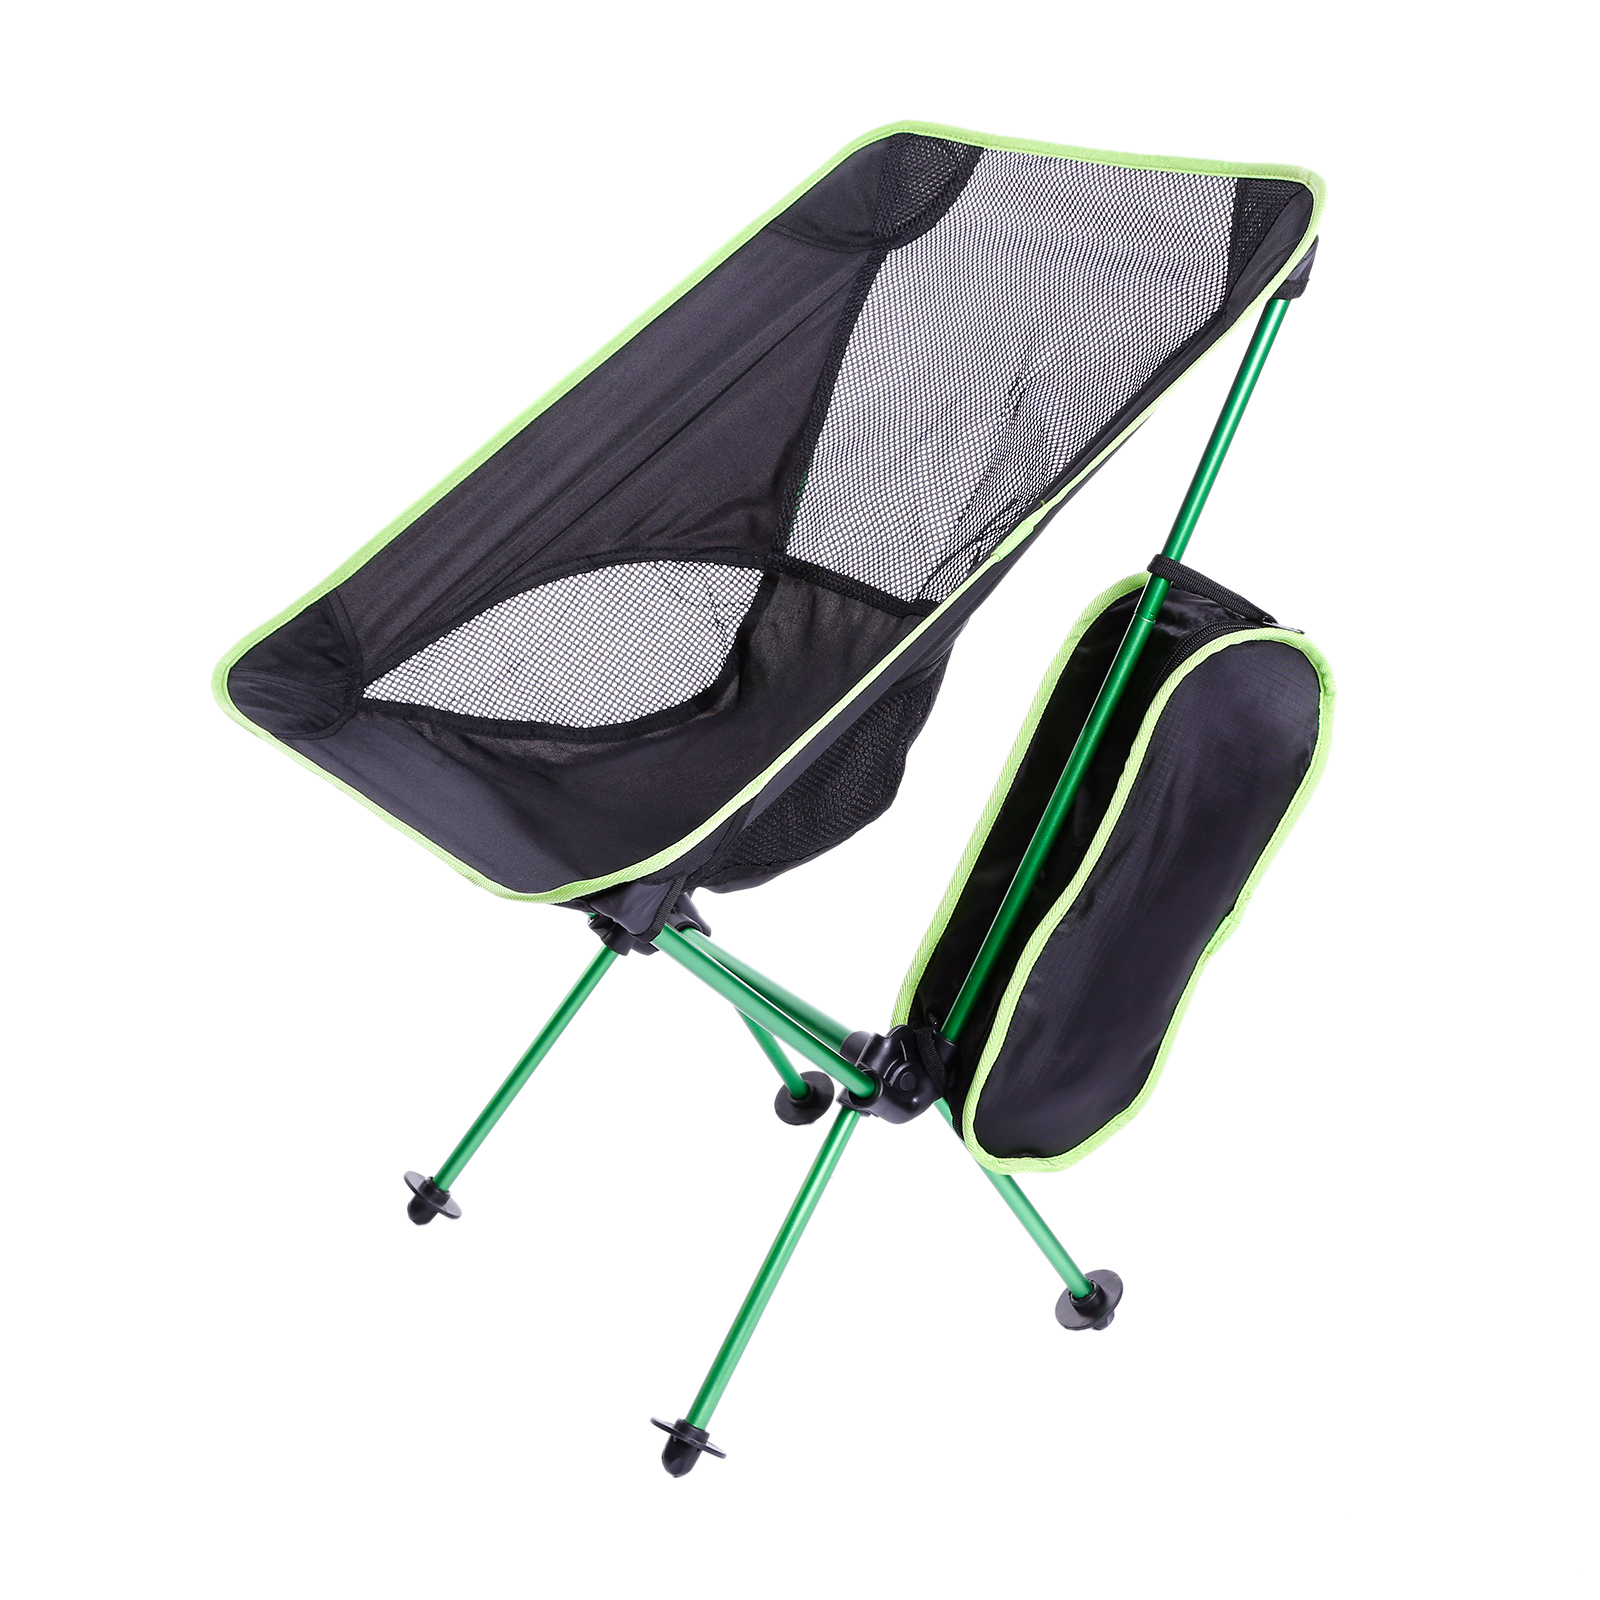 chaise pliable fold l ger camp bbq outdoor si ge pad p che plage jardin bureau ebay. Black Bedroom Furniture Sets. Home Design Ideas